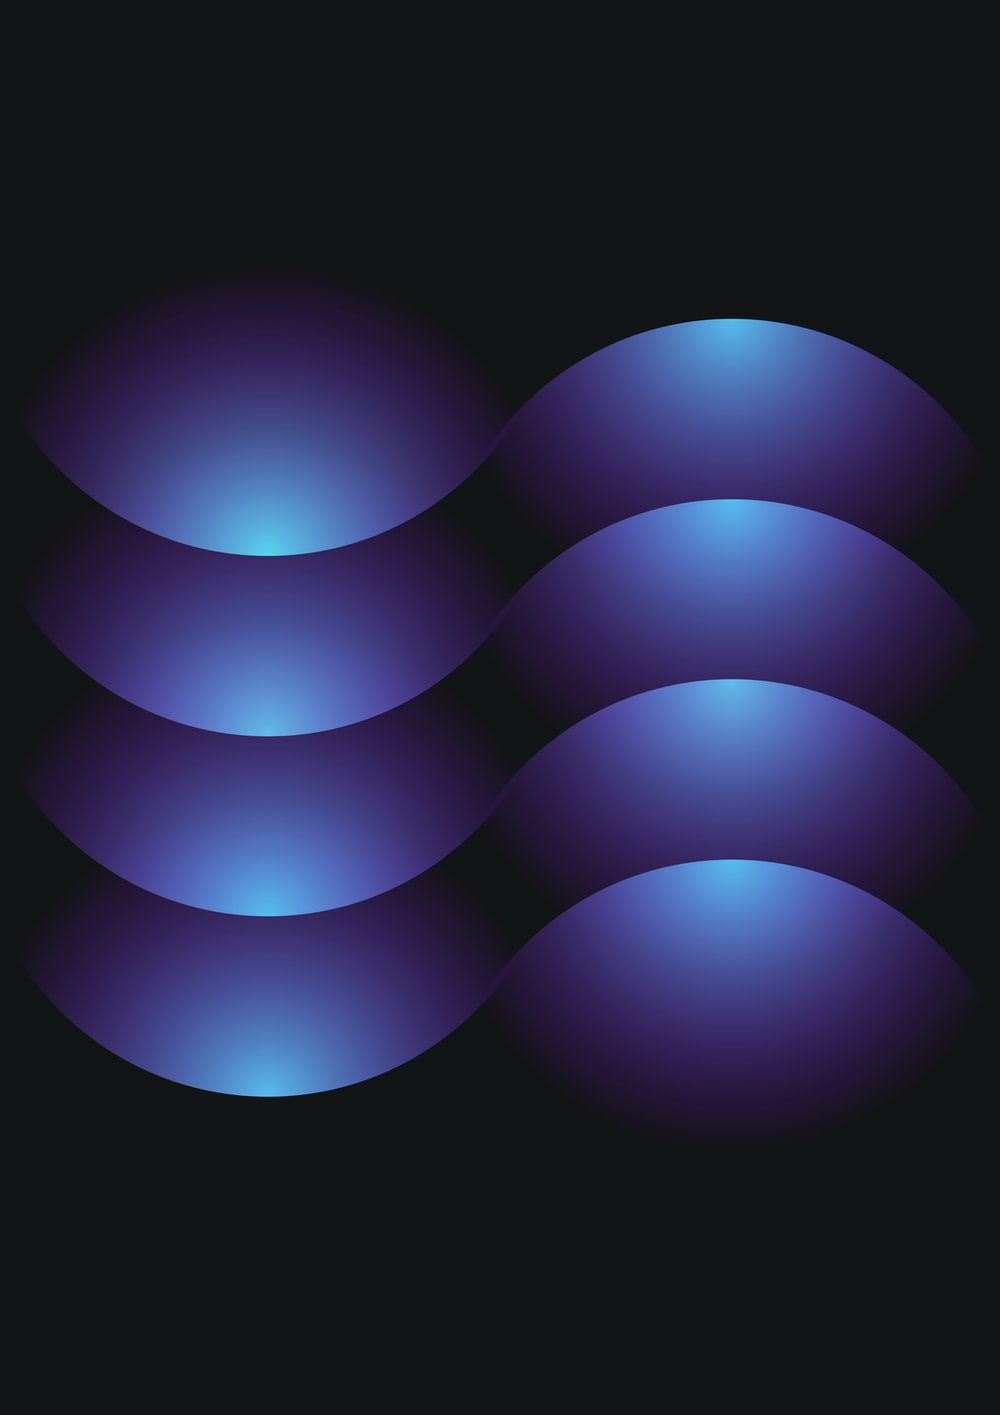 blue light on black background